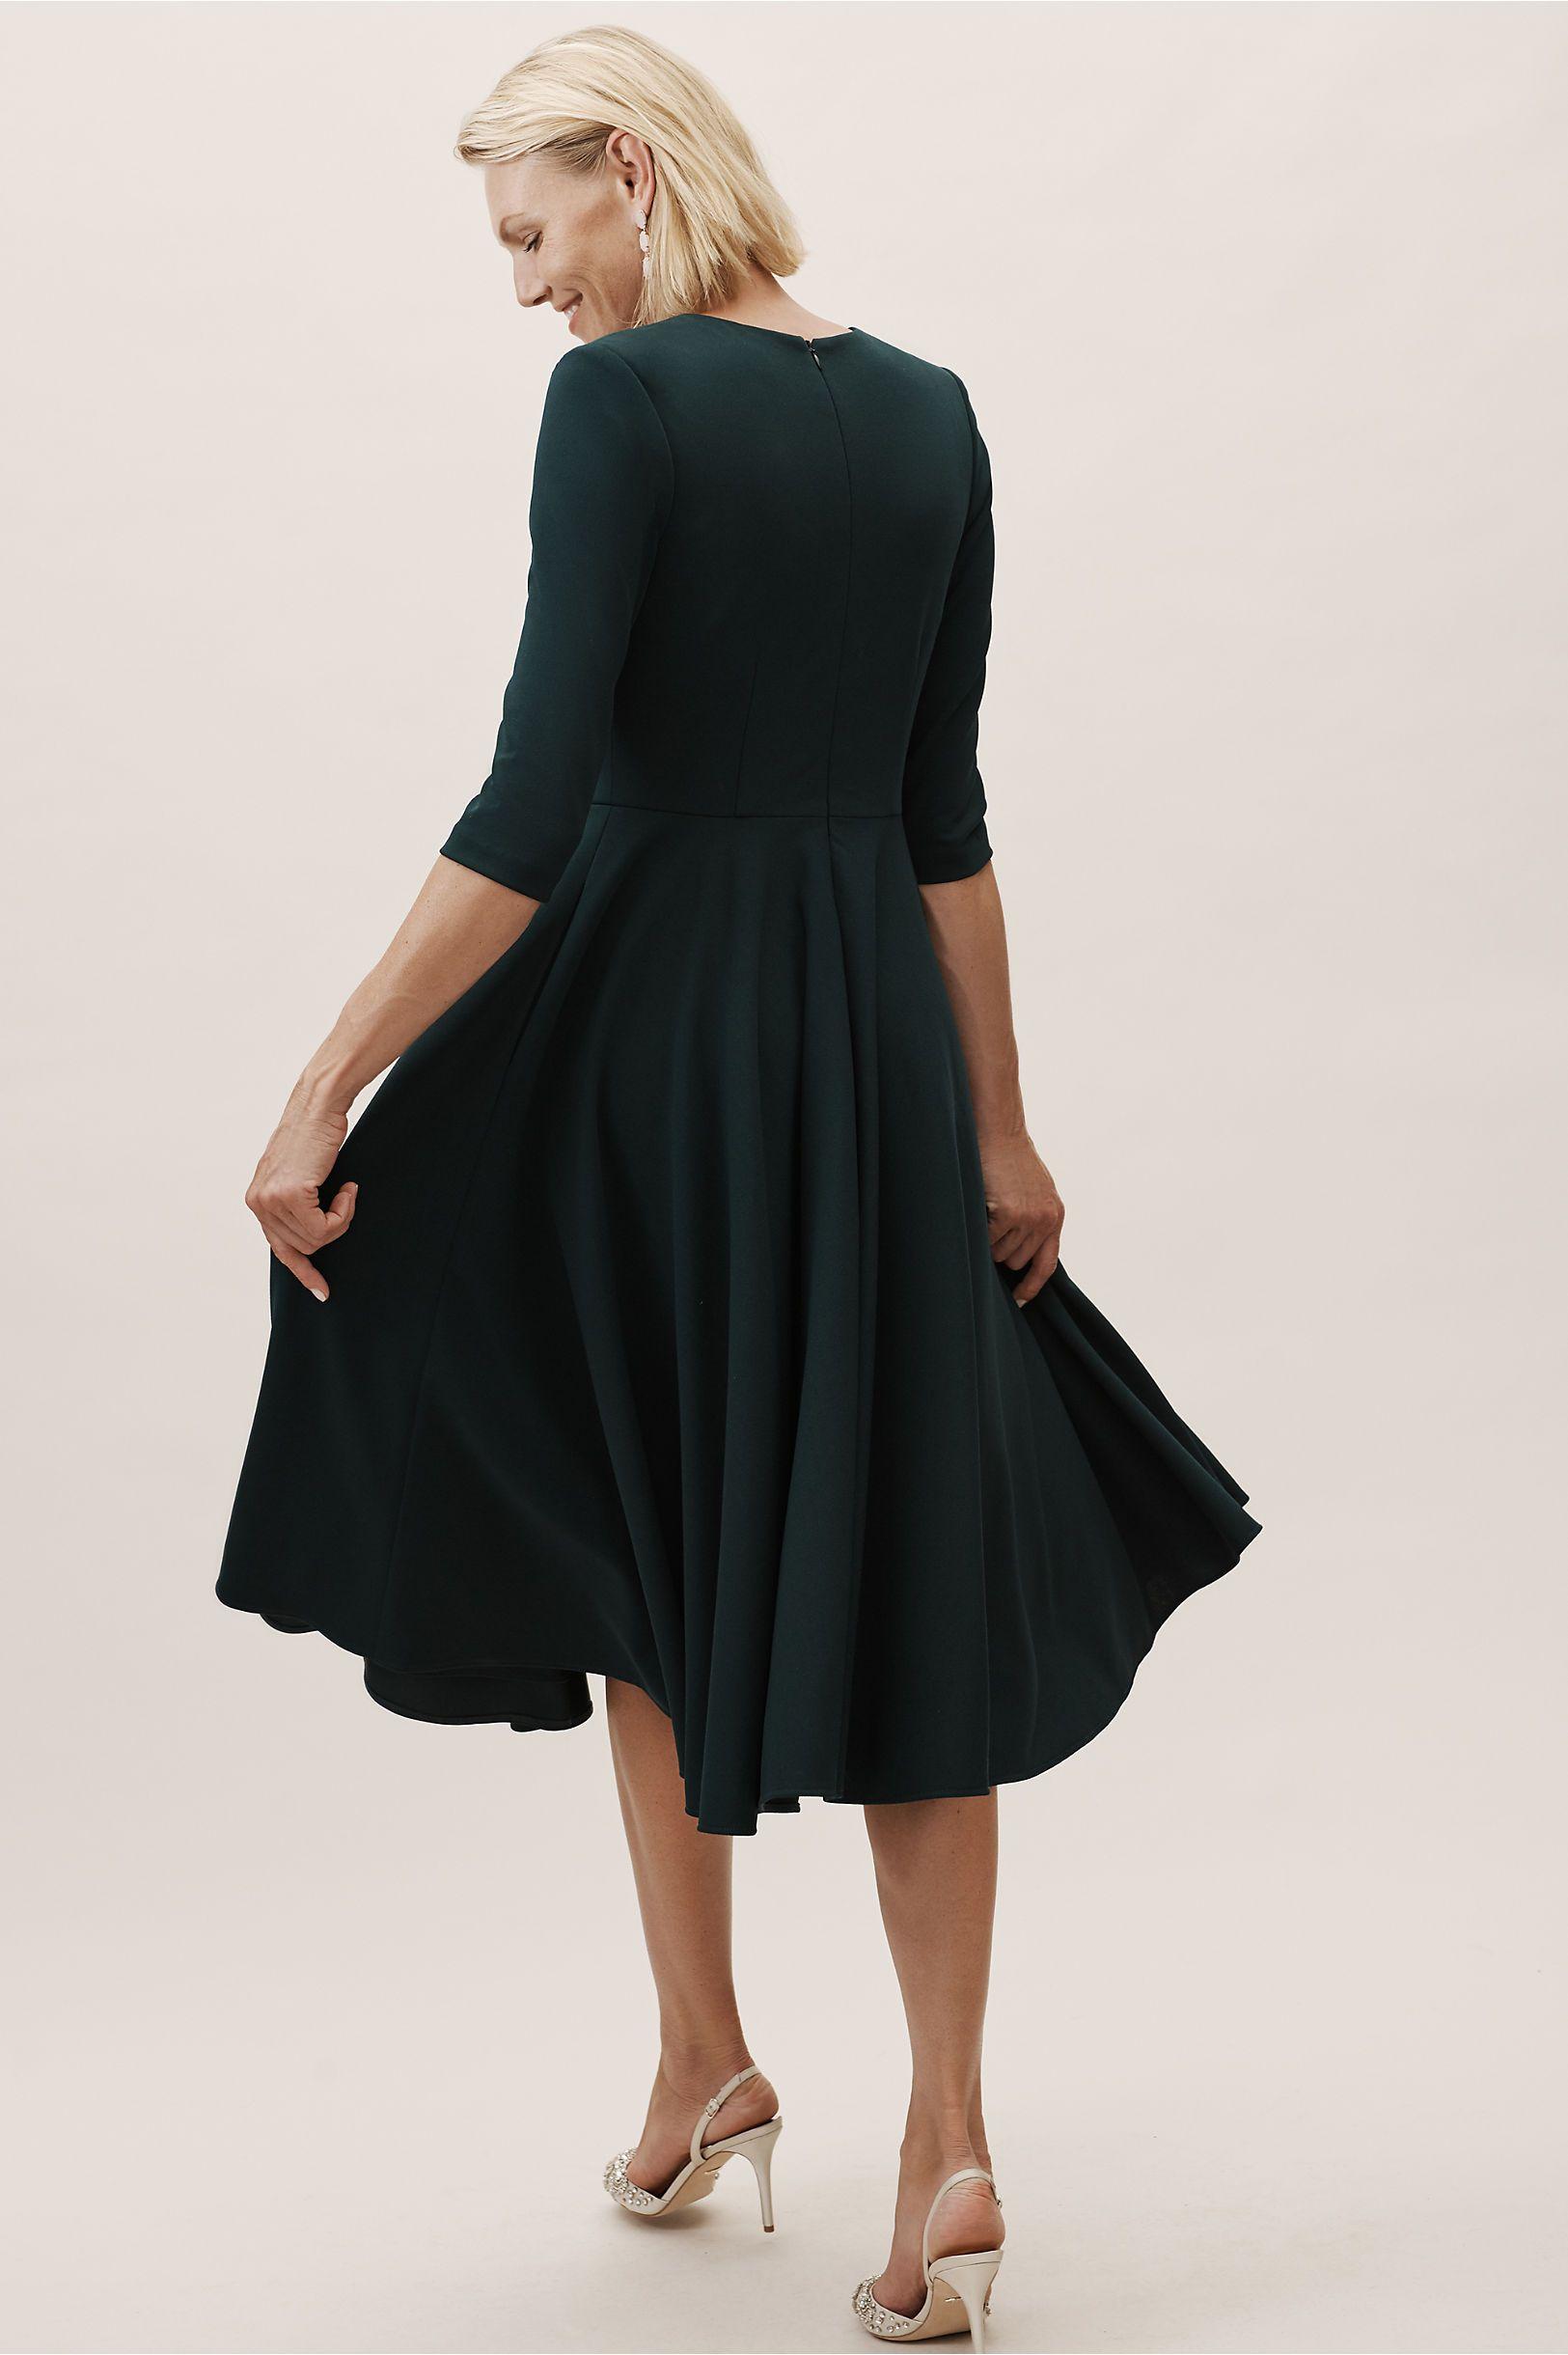 Valdis Dress Black tea length dress, Dresses, Sleek dress